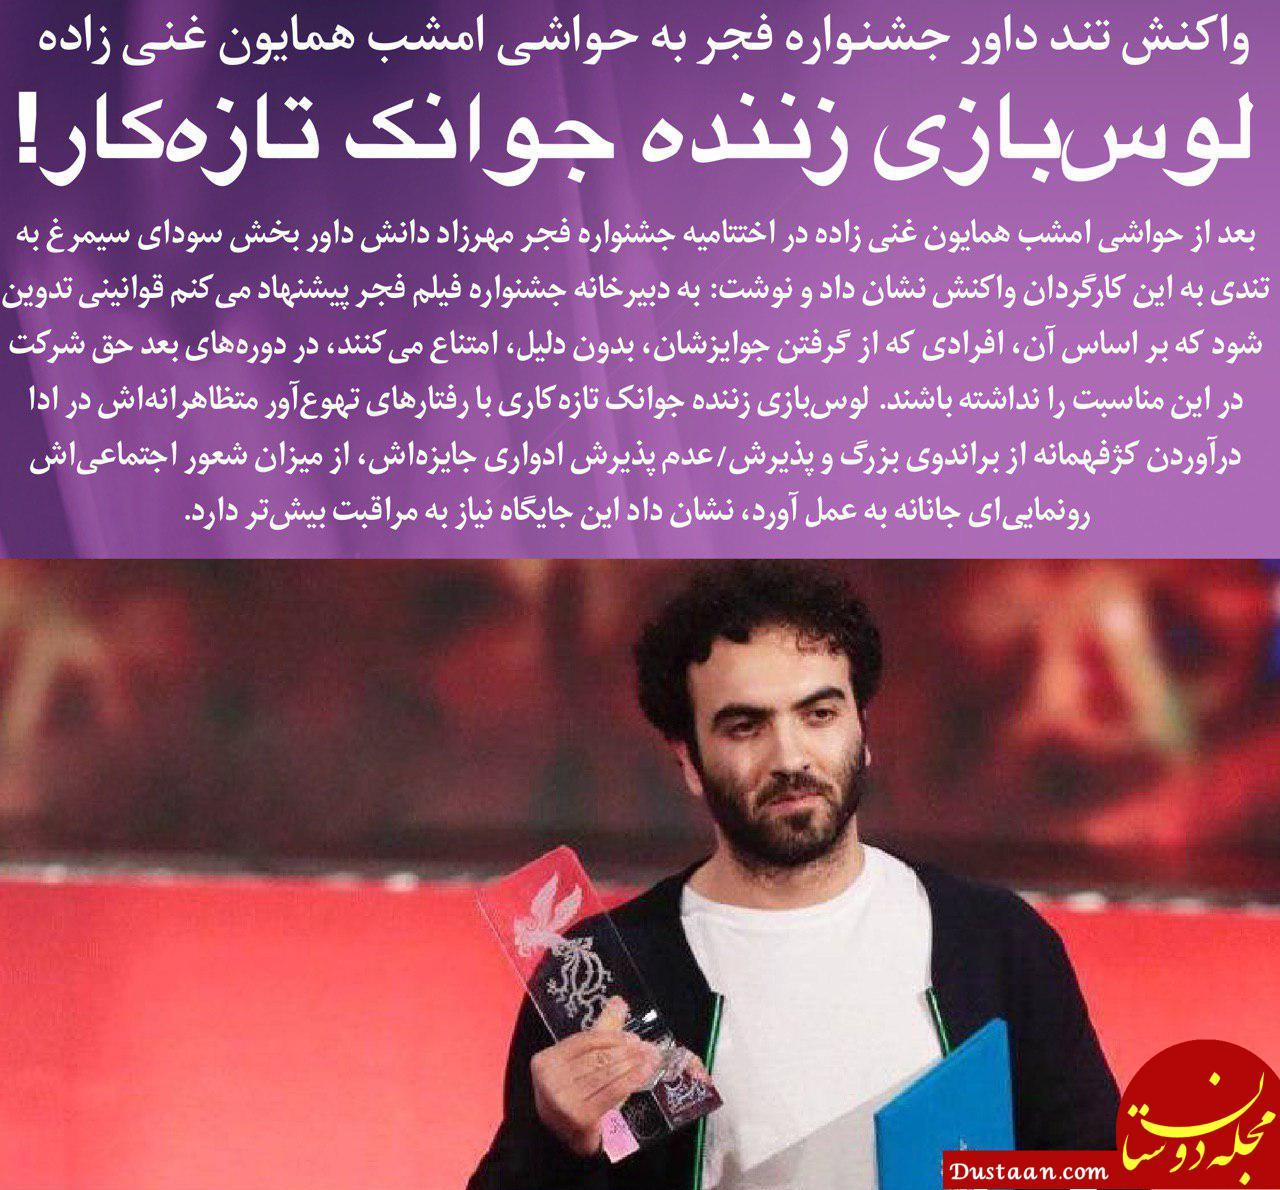 www.dustaan.com واکنش تند داور جشنواره فجر به حواشی امشب همایون غنی زاده